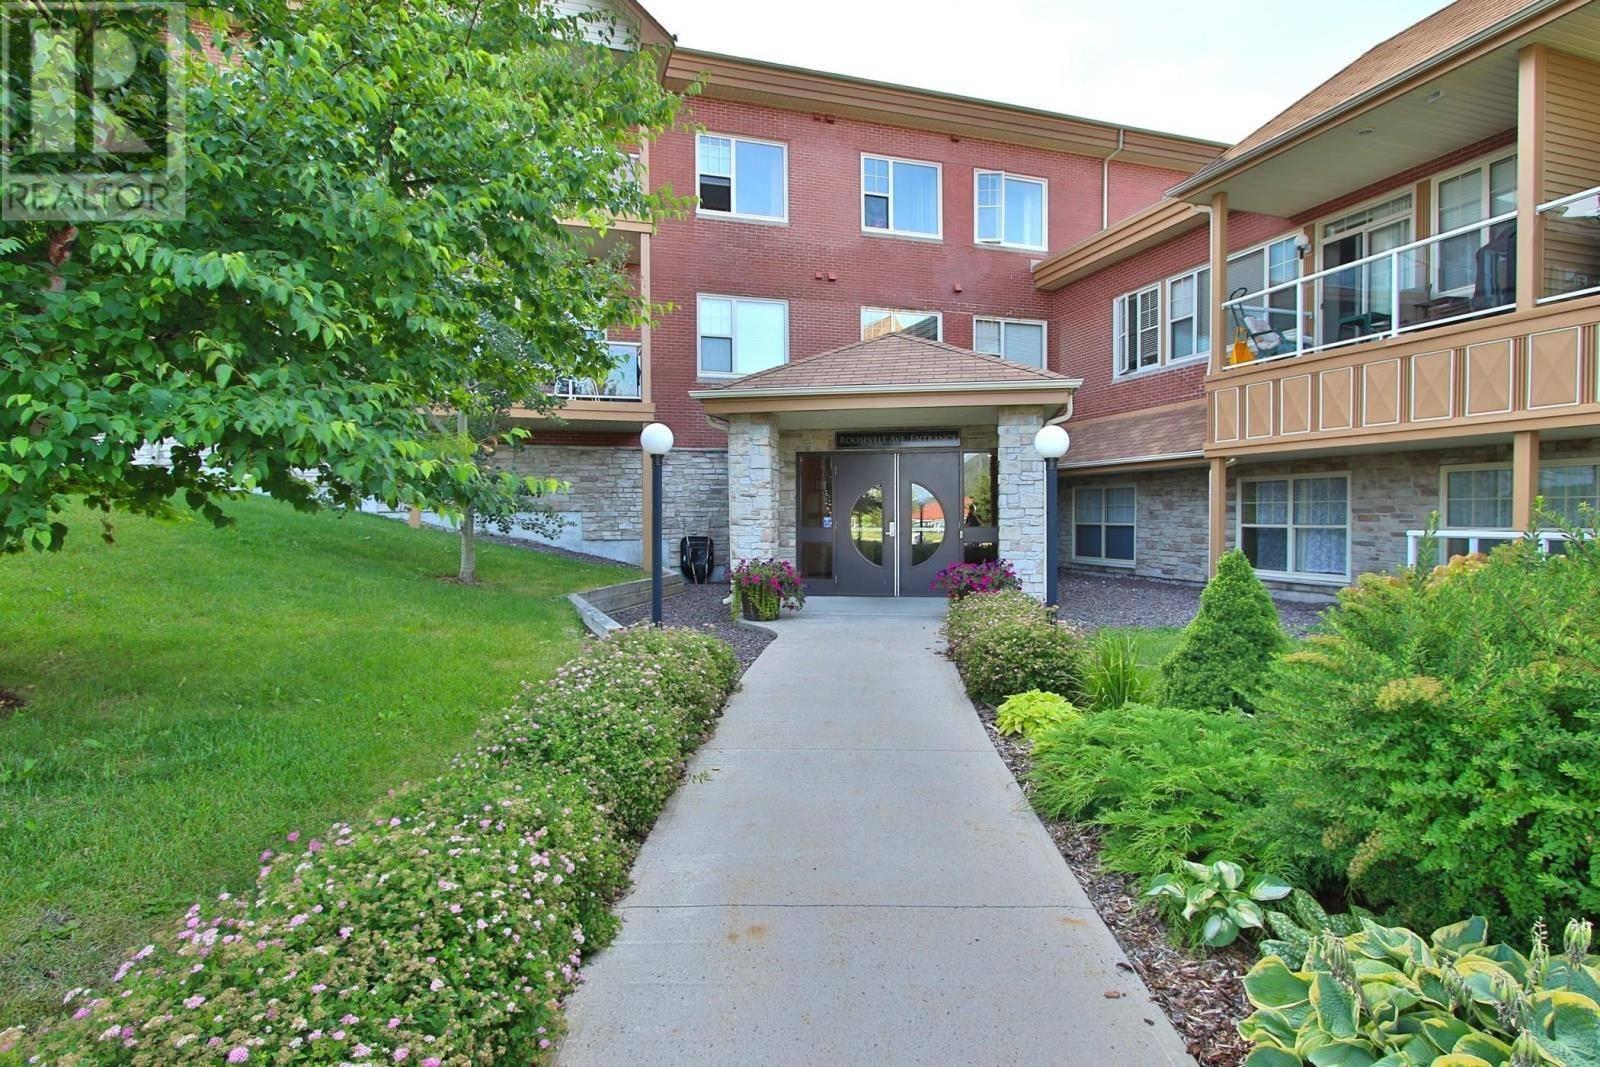 House for sale at 59 Roosevelt Ave Unit 302 St. John's Newfoundland - MLS: 1202361